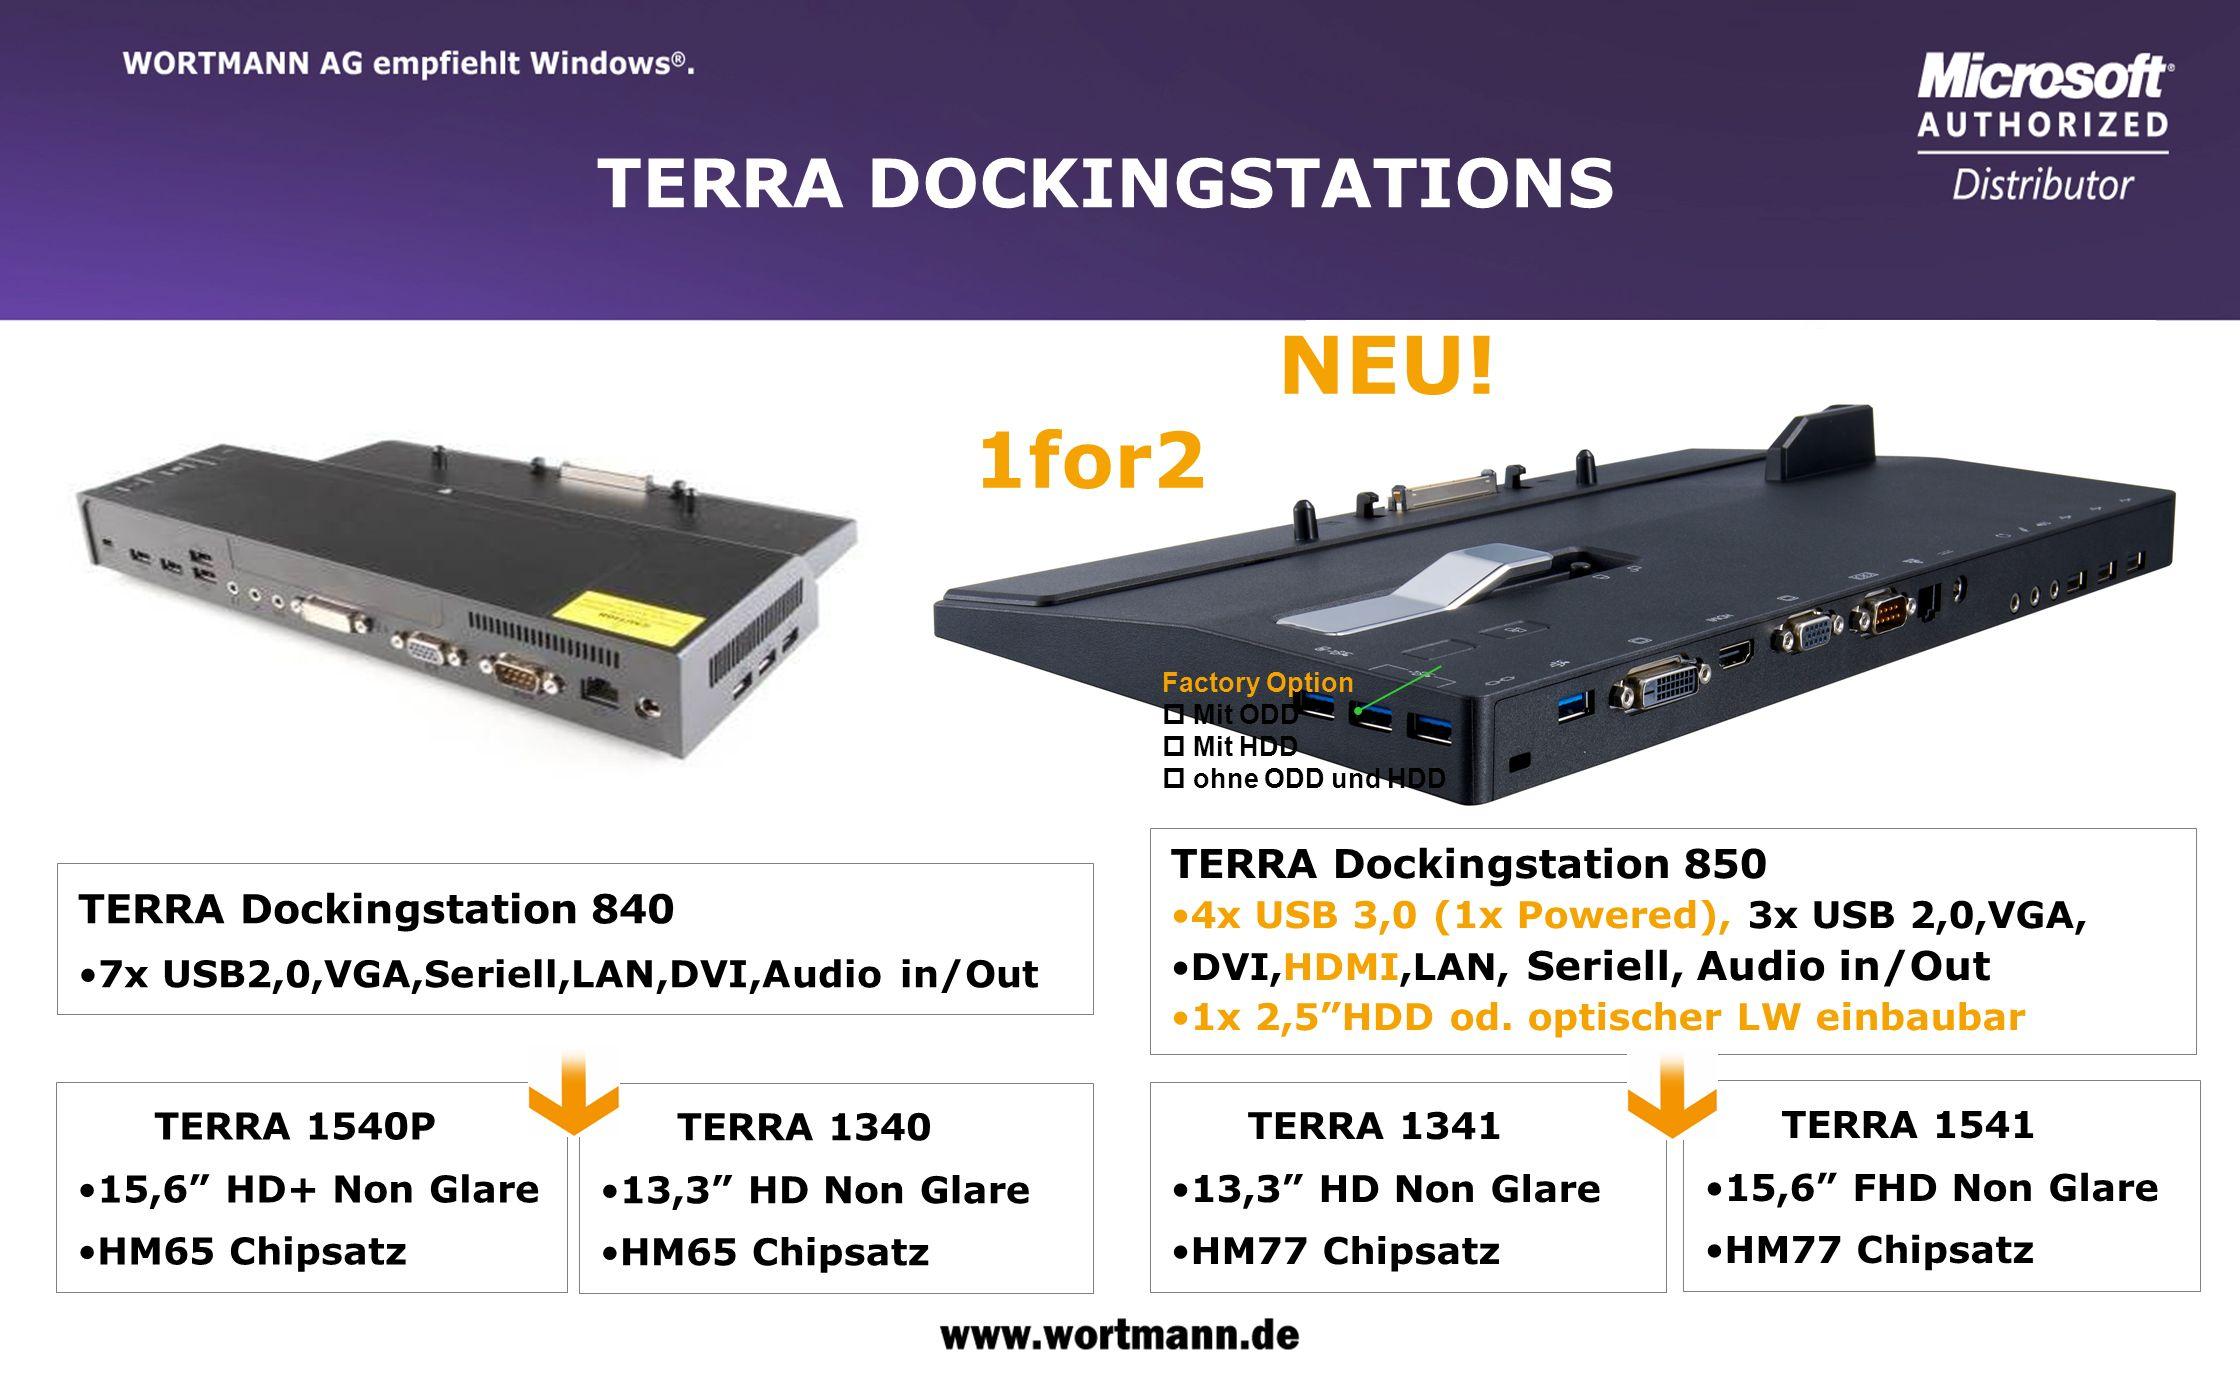 www.wortmann.de TERRA DOCKINGSTATIONS TERRA Dockingstation 840 7x USB2,0,VGA,Seriell,LAN,DVI,Audio in/Out TERRA 1340 13,3 HD Non Glare HM65 Chipsatz T